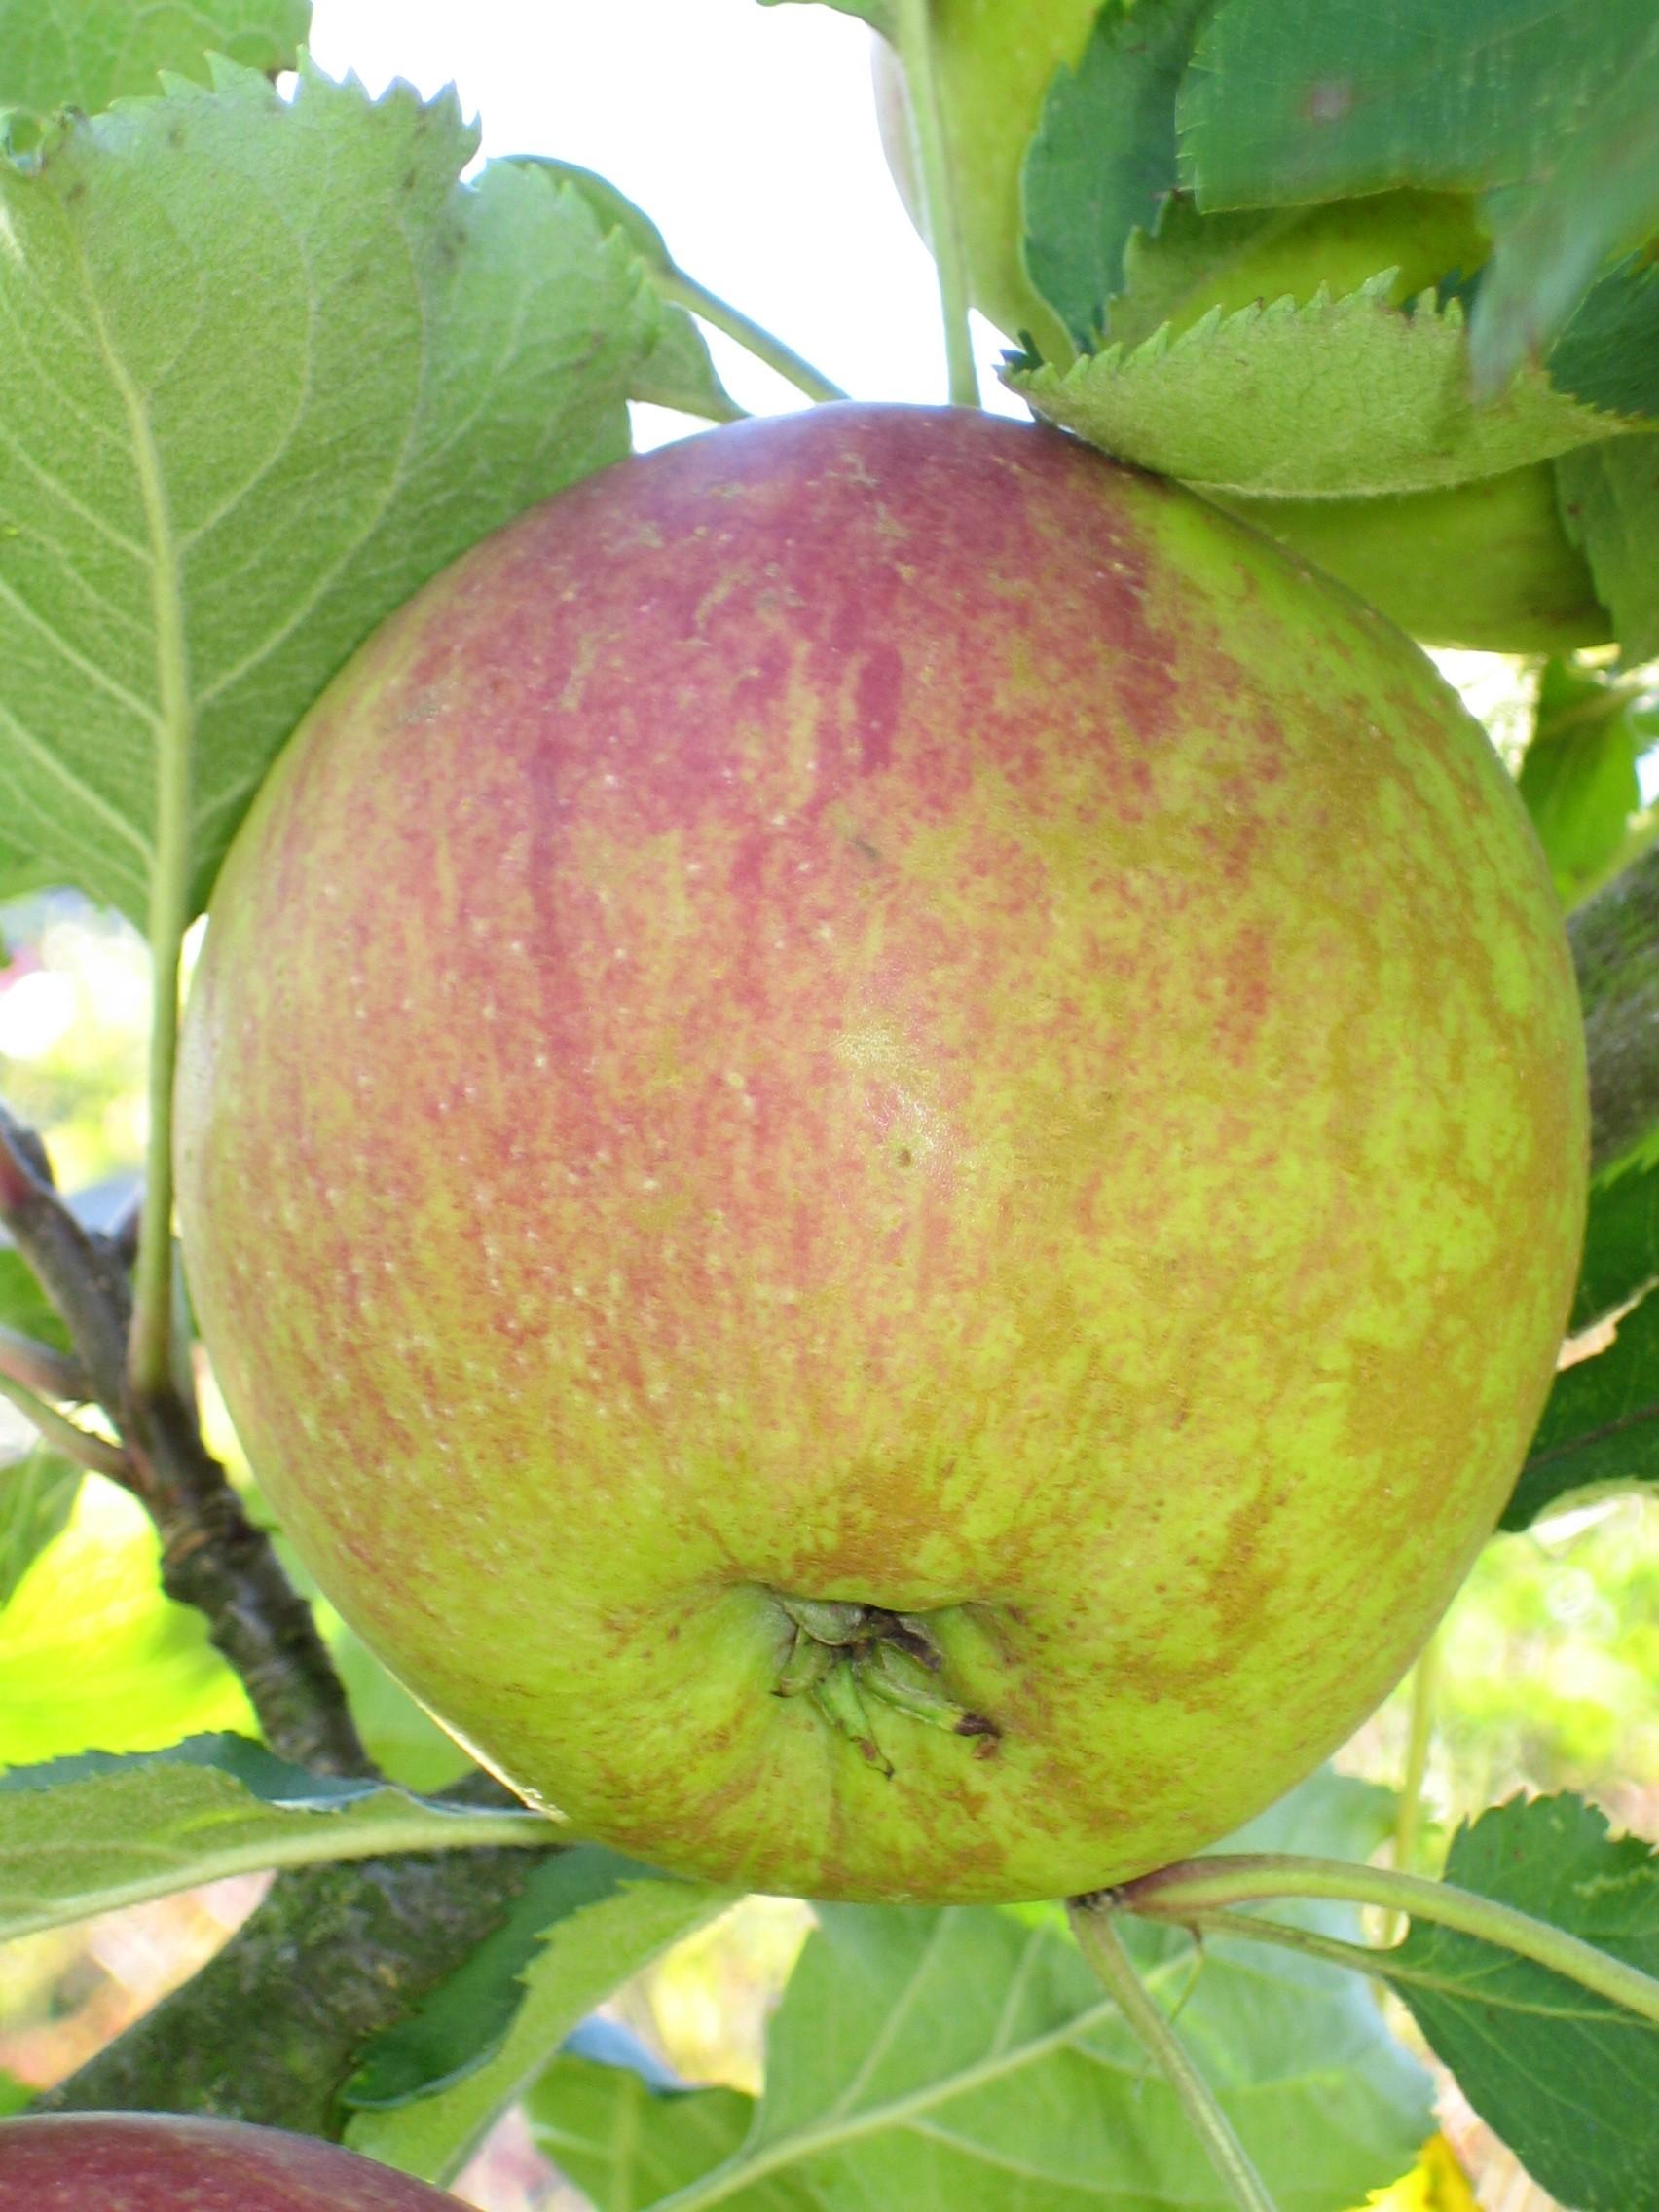 file apple on a tree cox 39 s orange pippin cultivar jpg wikimedia commons. Black Bedroom Furniture Sets. Home Design Ideas